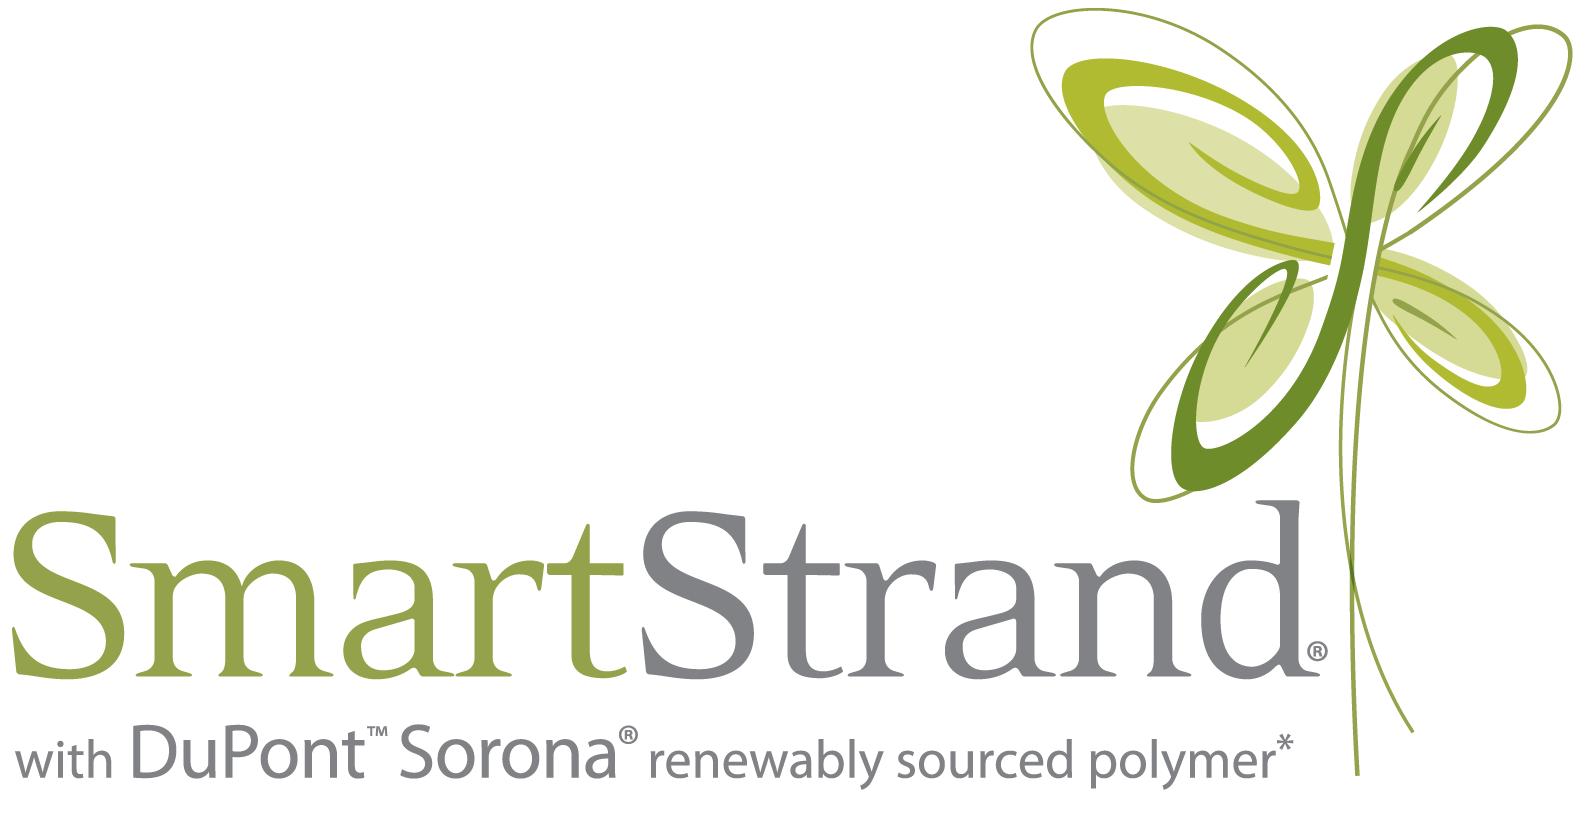 smartstrand (1)